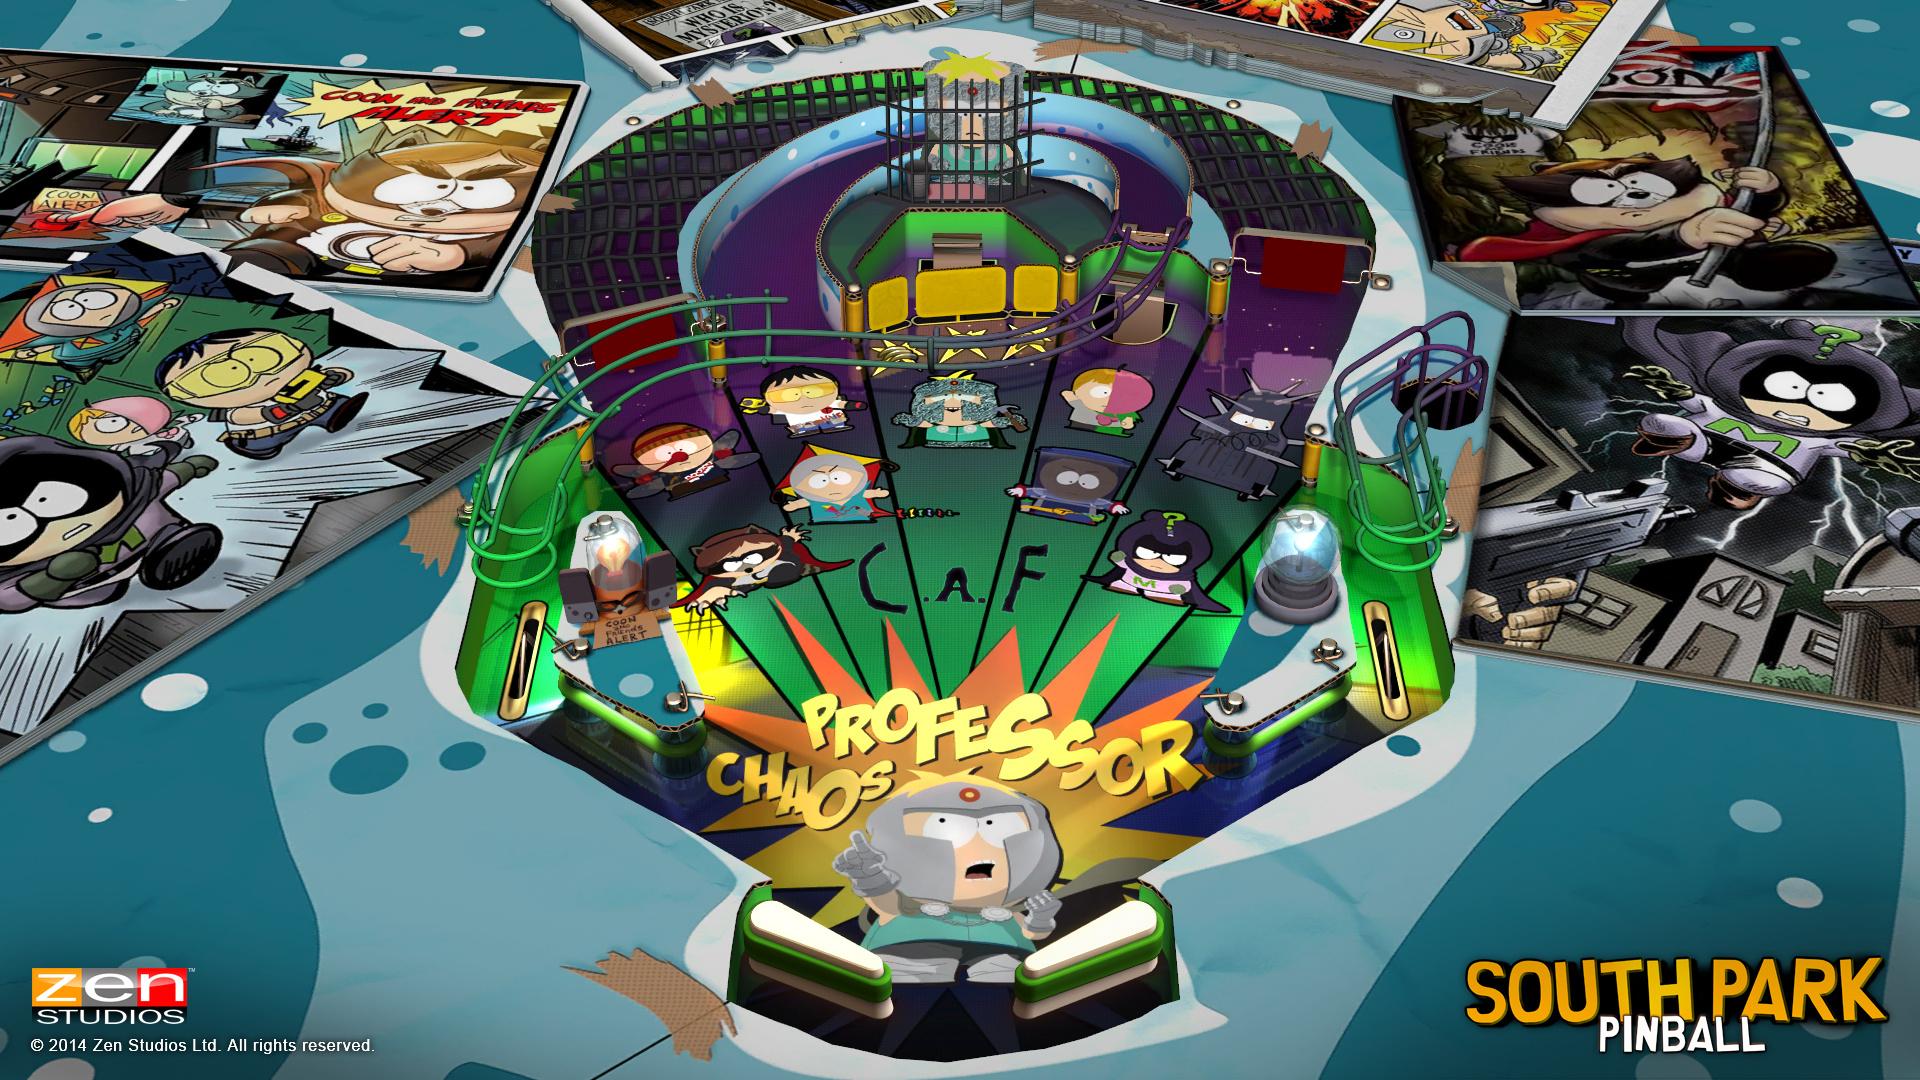 xbox one pinball fx2 south park screenshots pinball fx2 south park